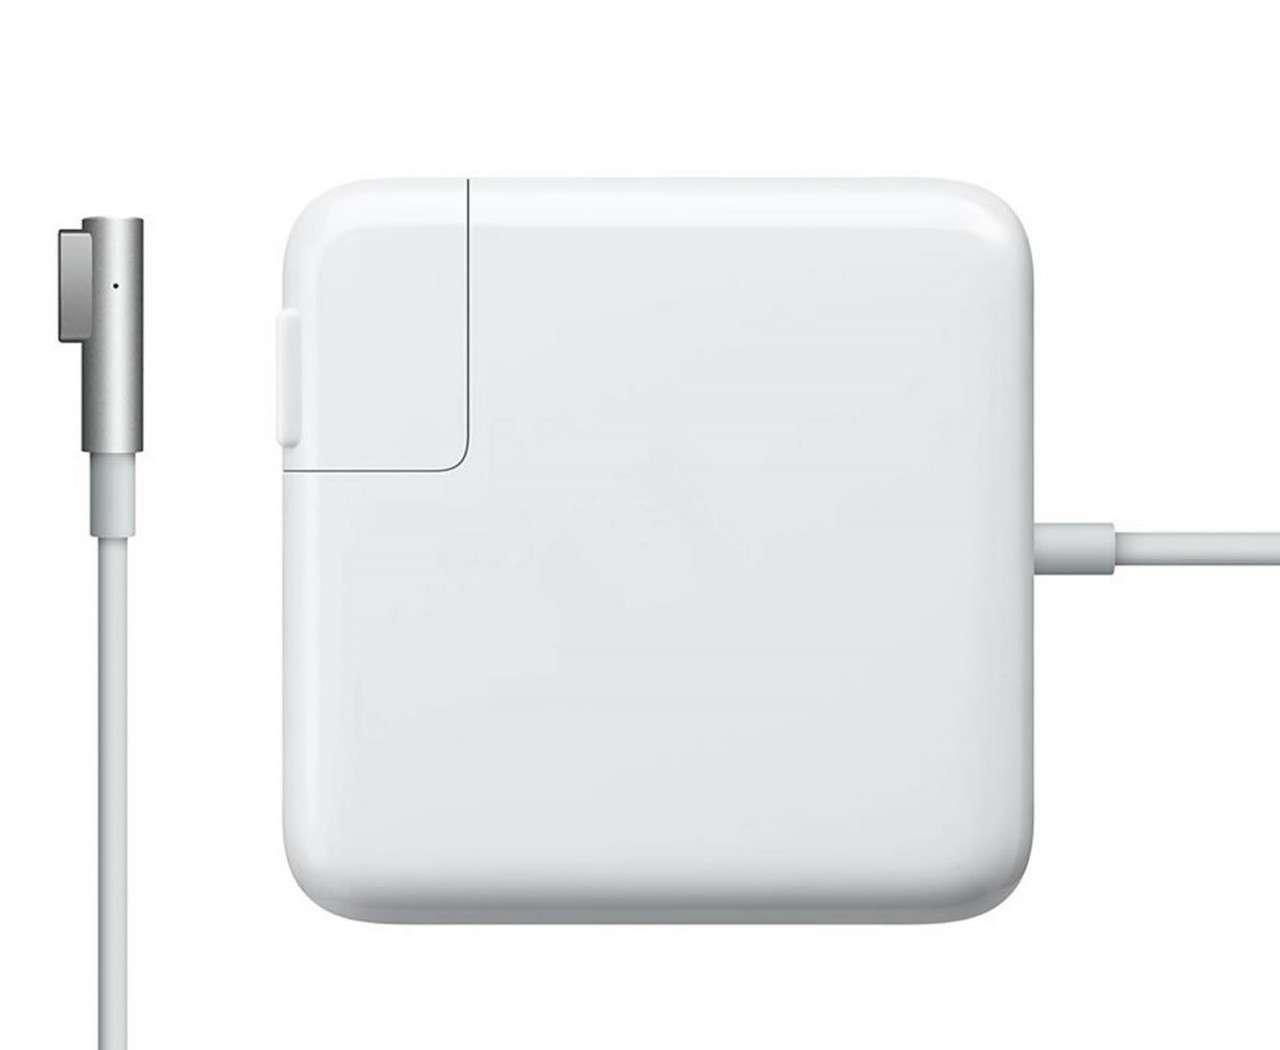 Incarcator Apple MacBook MagSafe 60W imagine powerlaptop.ro 2021